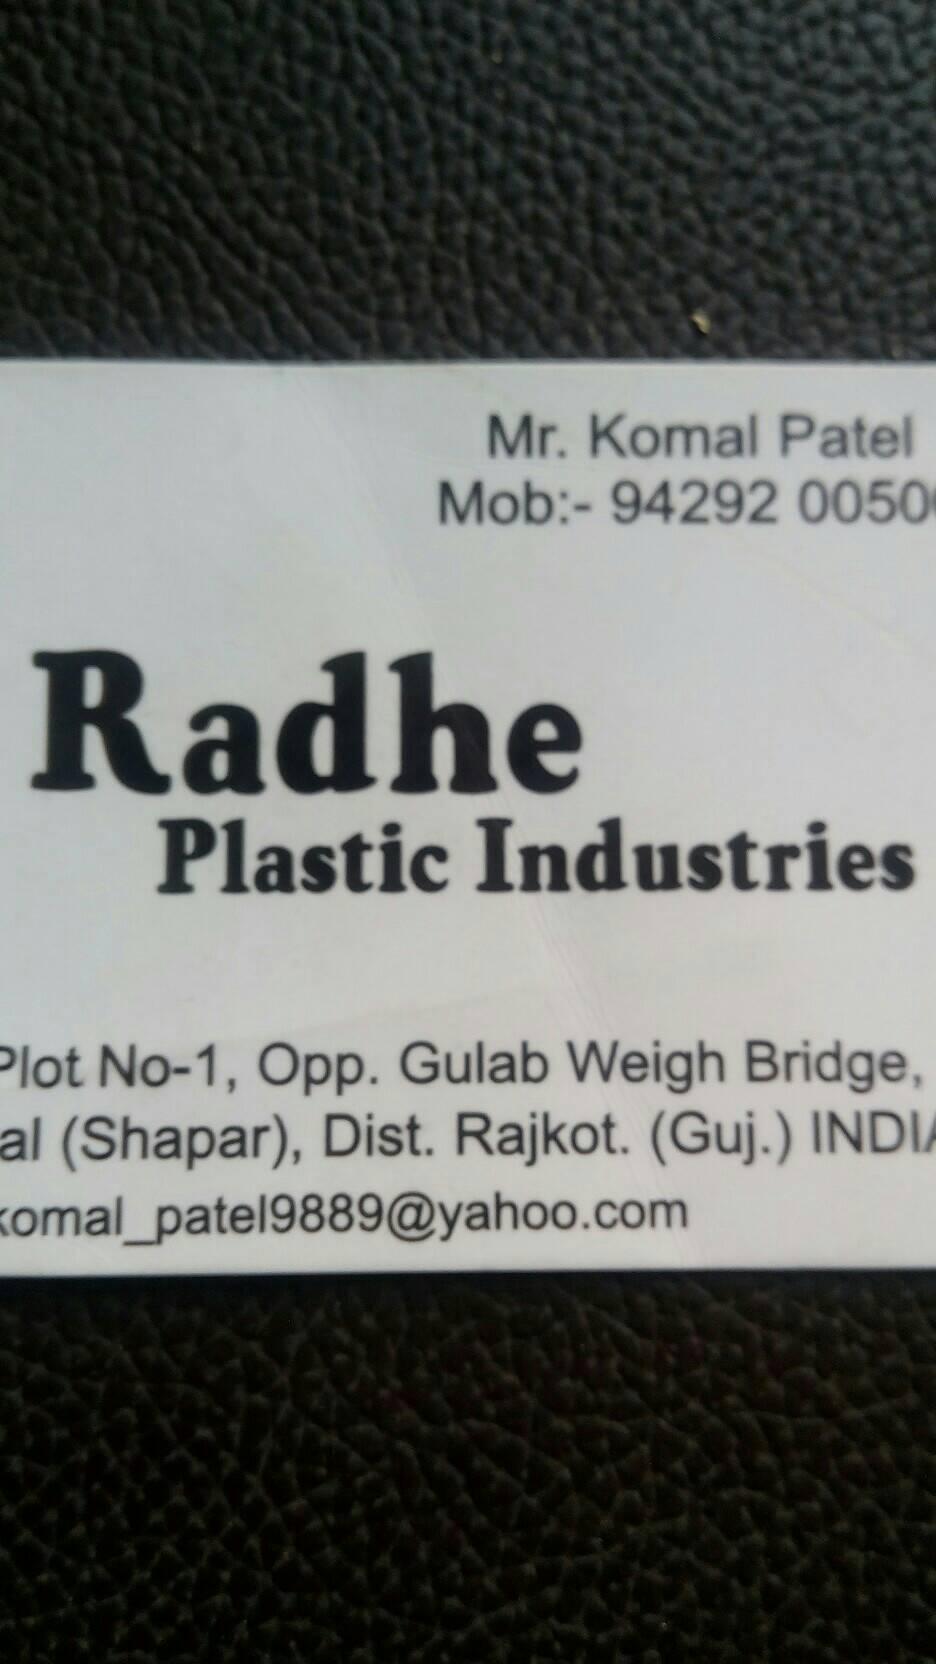 Radhe Plastic Industries